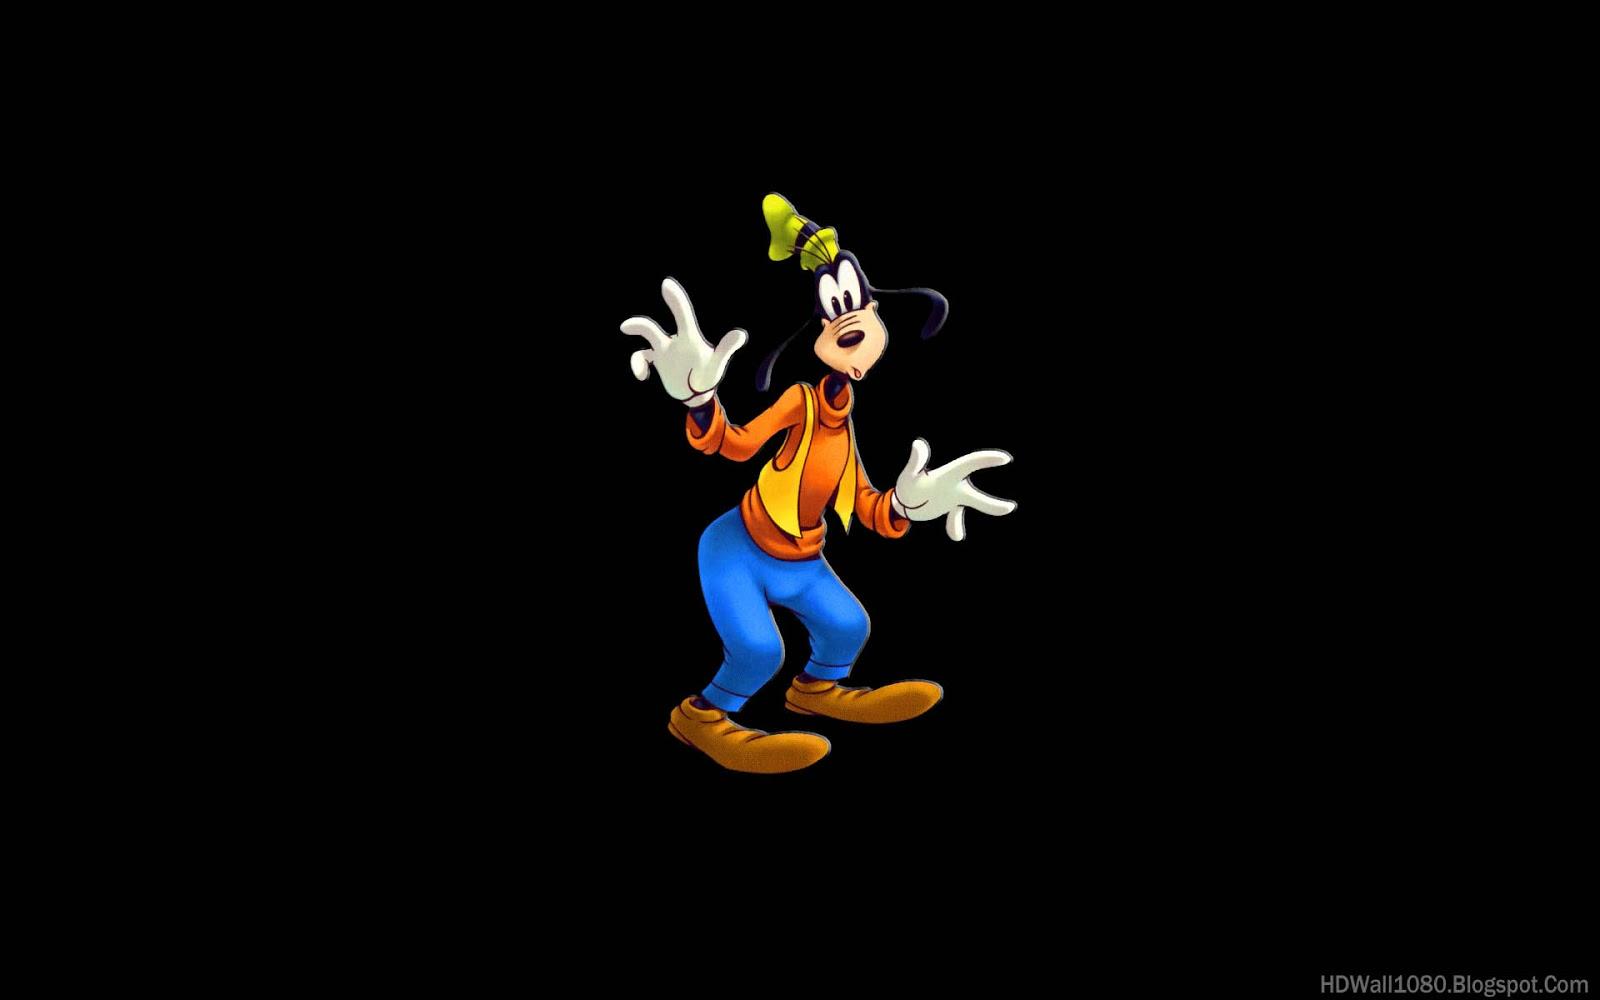 Disney Cartoon One Man HD Movie Wallpapers r Desktop Backgrounds 1600x1000